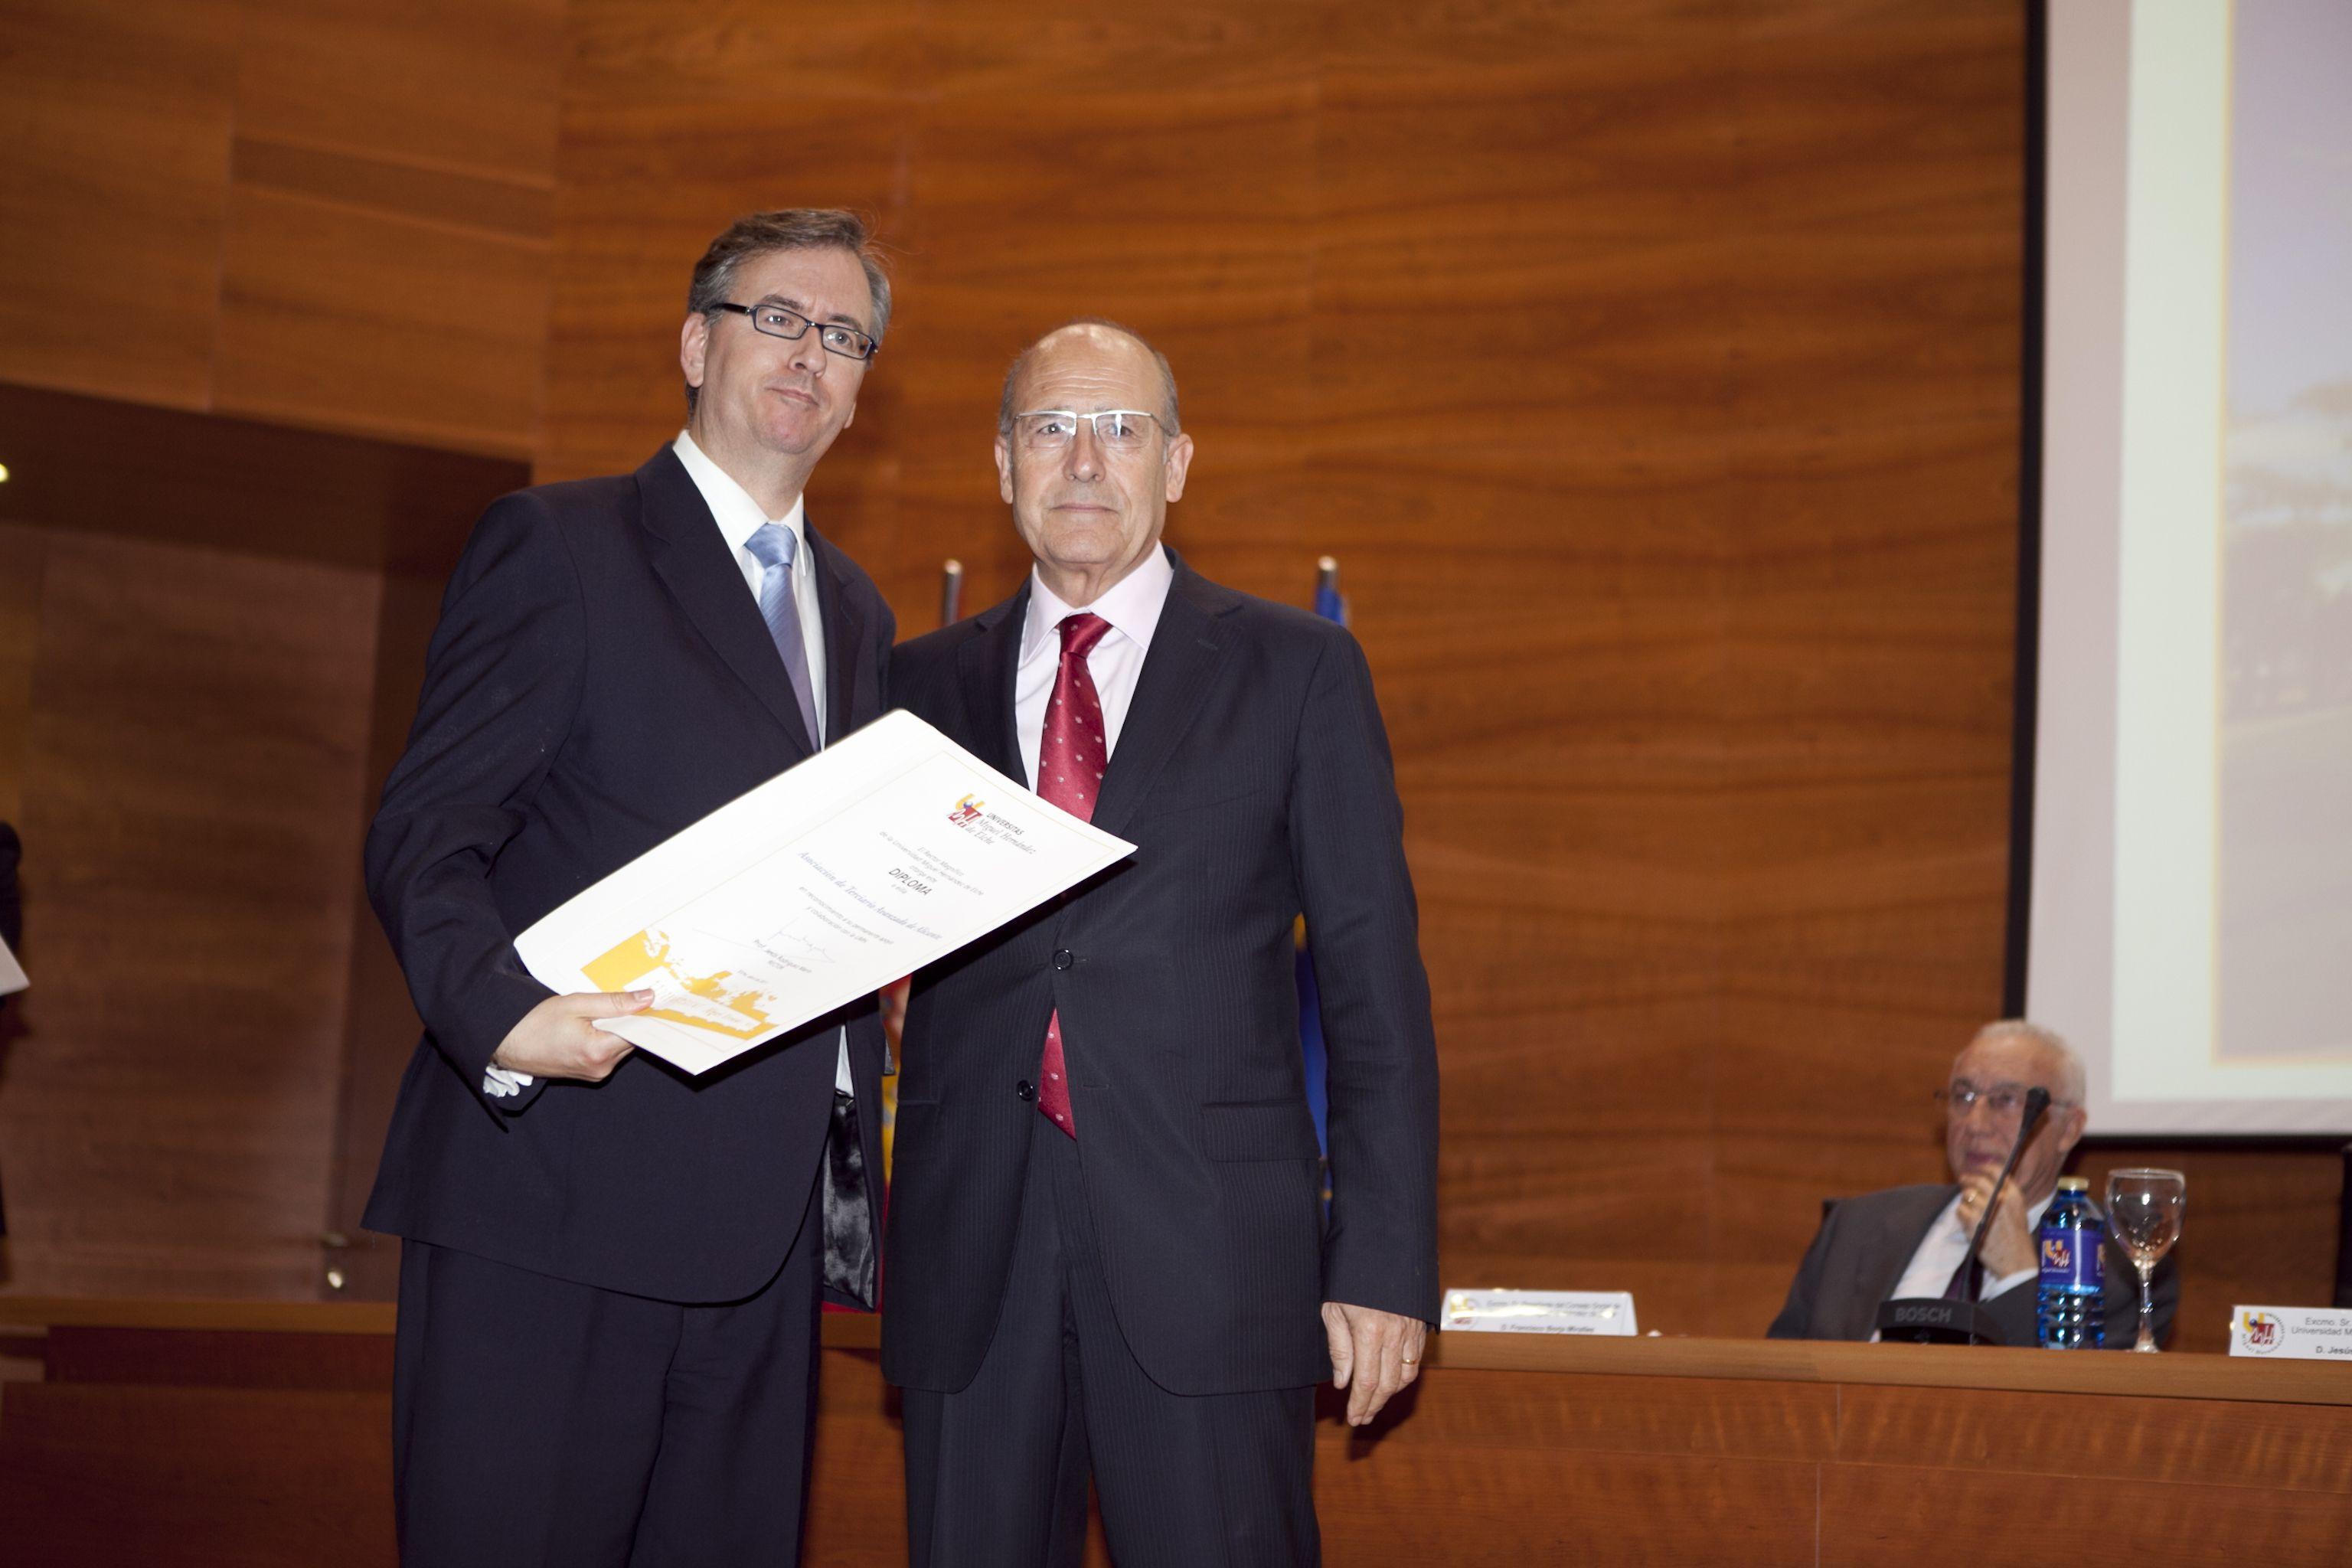 umh-diplomas-rector_mg_6568.jpg